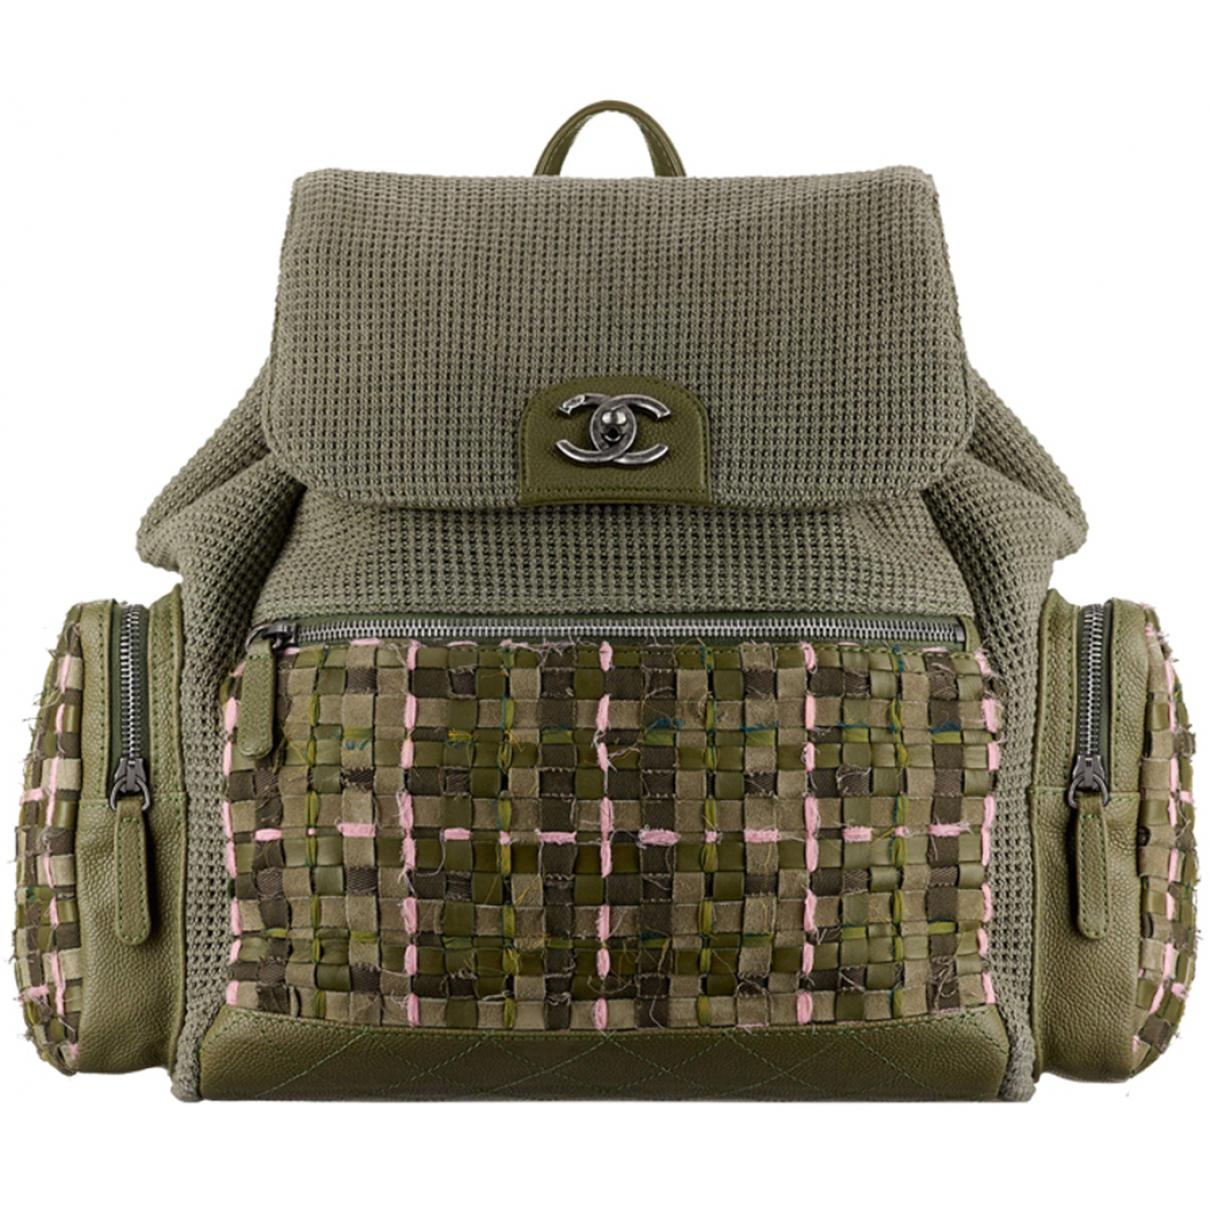 0465ec048d5b55 Chanel. Women's Green Khaki Tweed Backpacks. $4,264 From Vestiaire  Collective